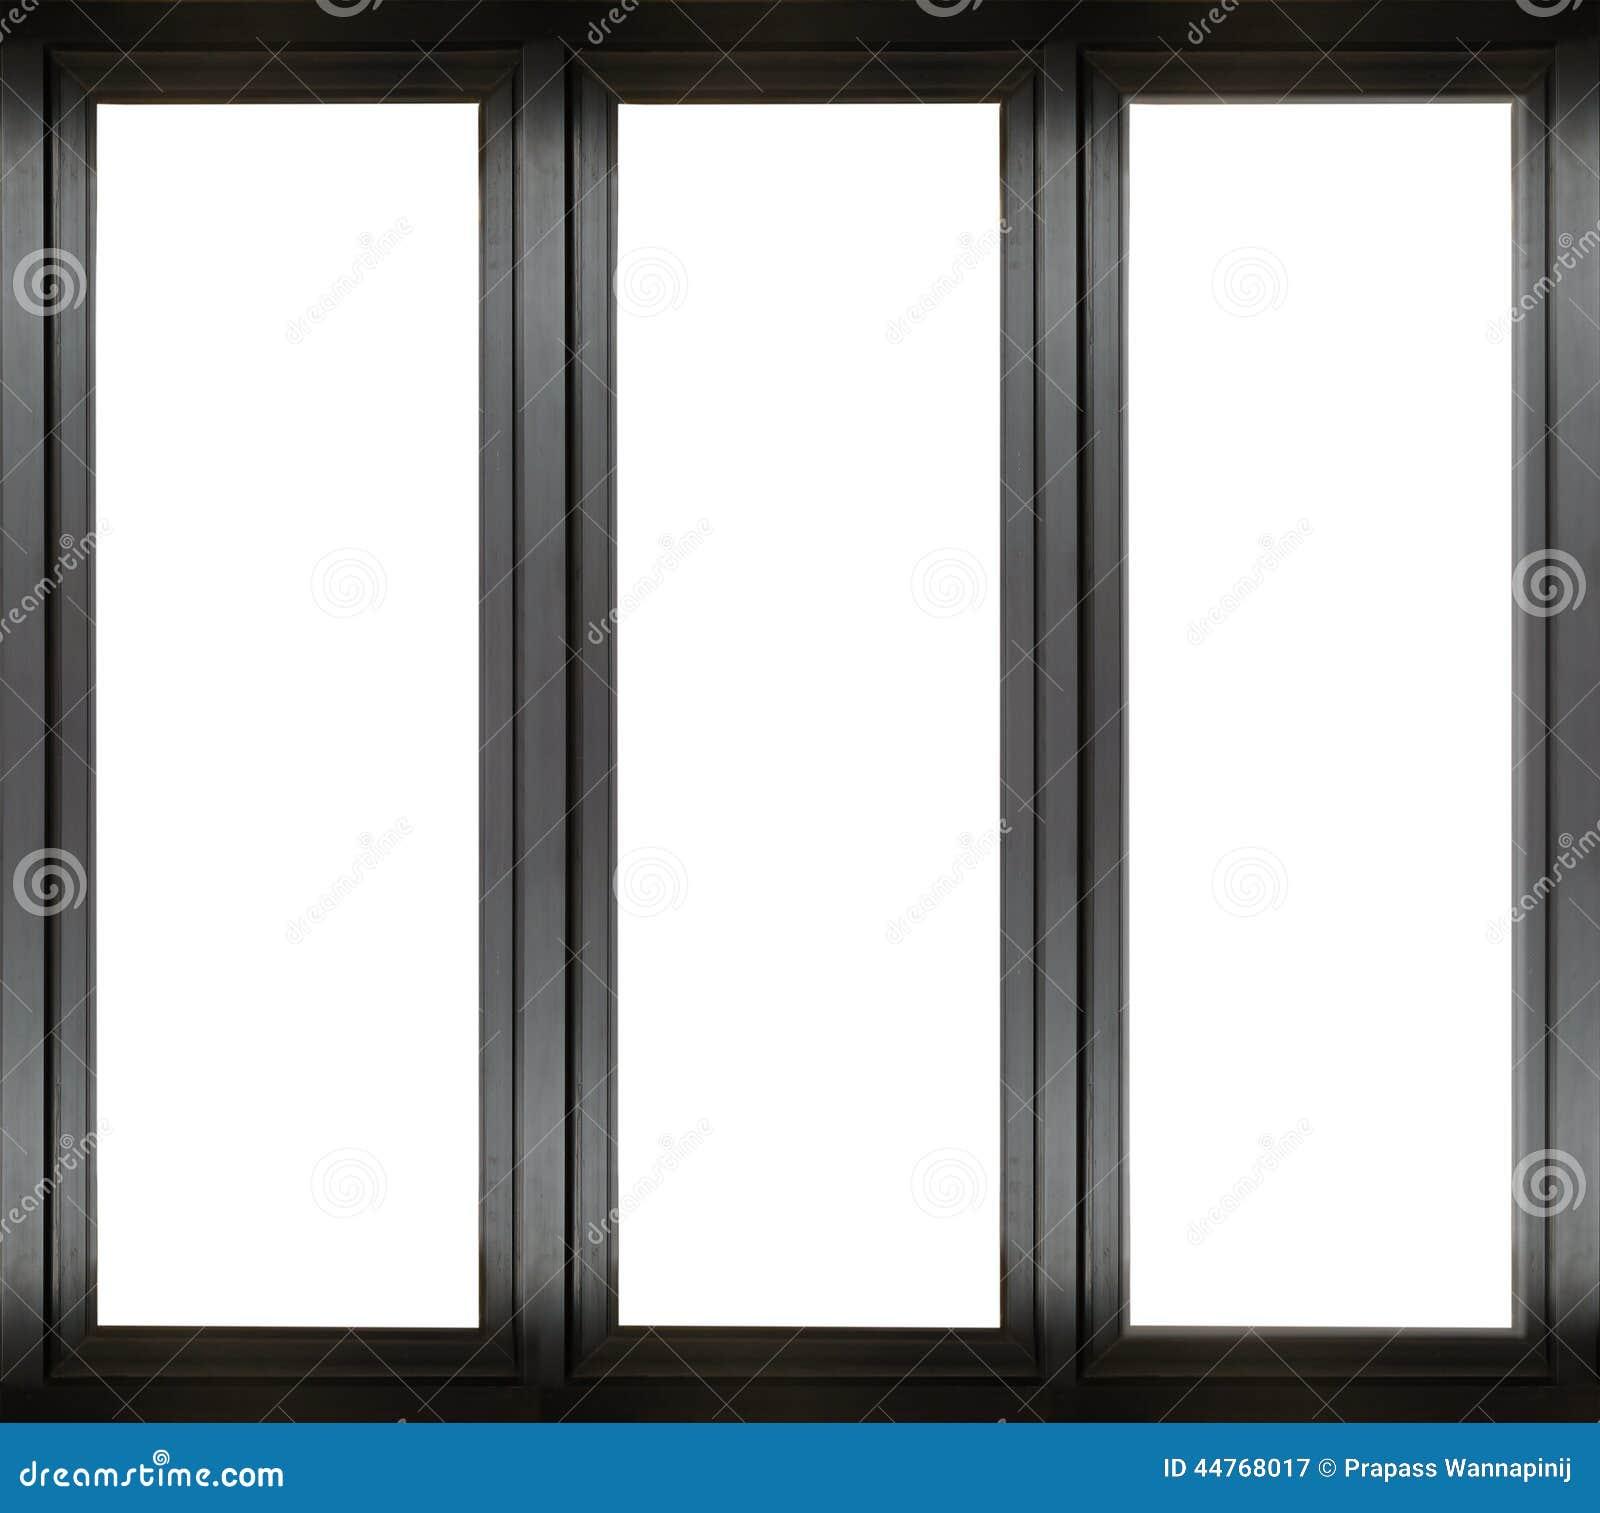 82a328 black metal window frame stock photo image 44768017 windows metal frame 121 picture - Metal Window Frames